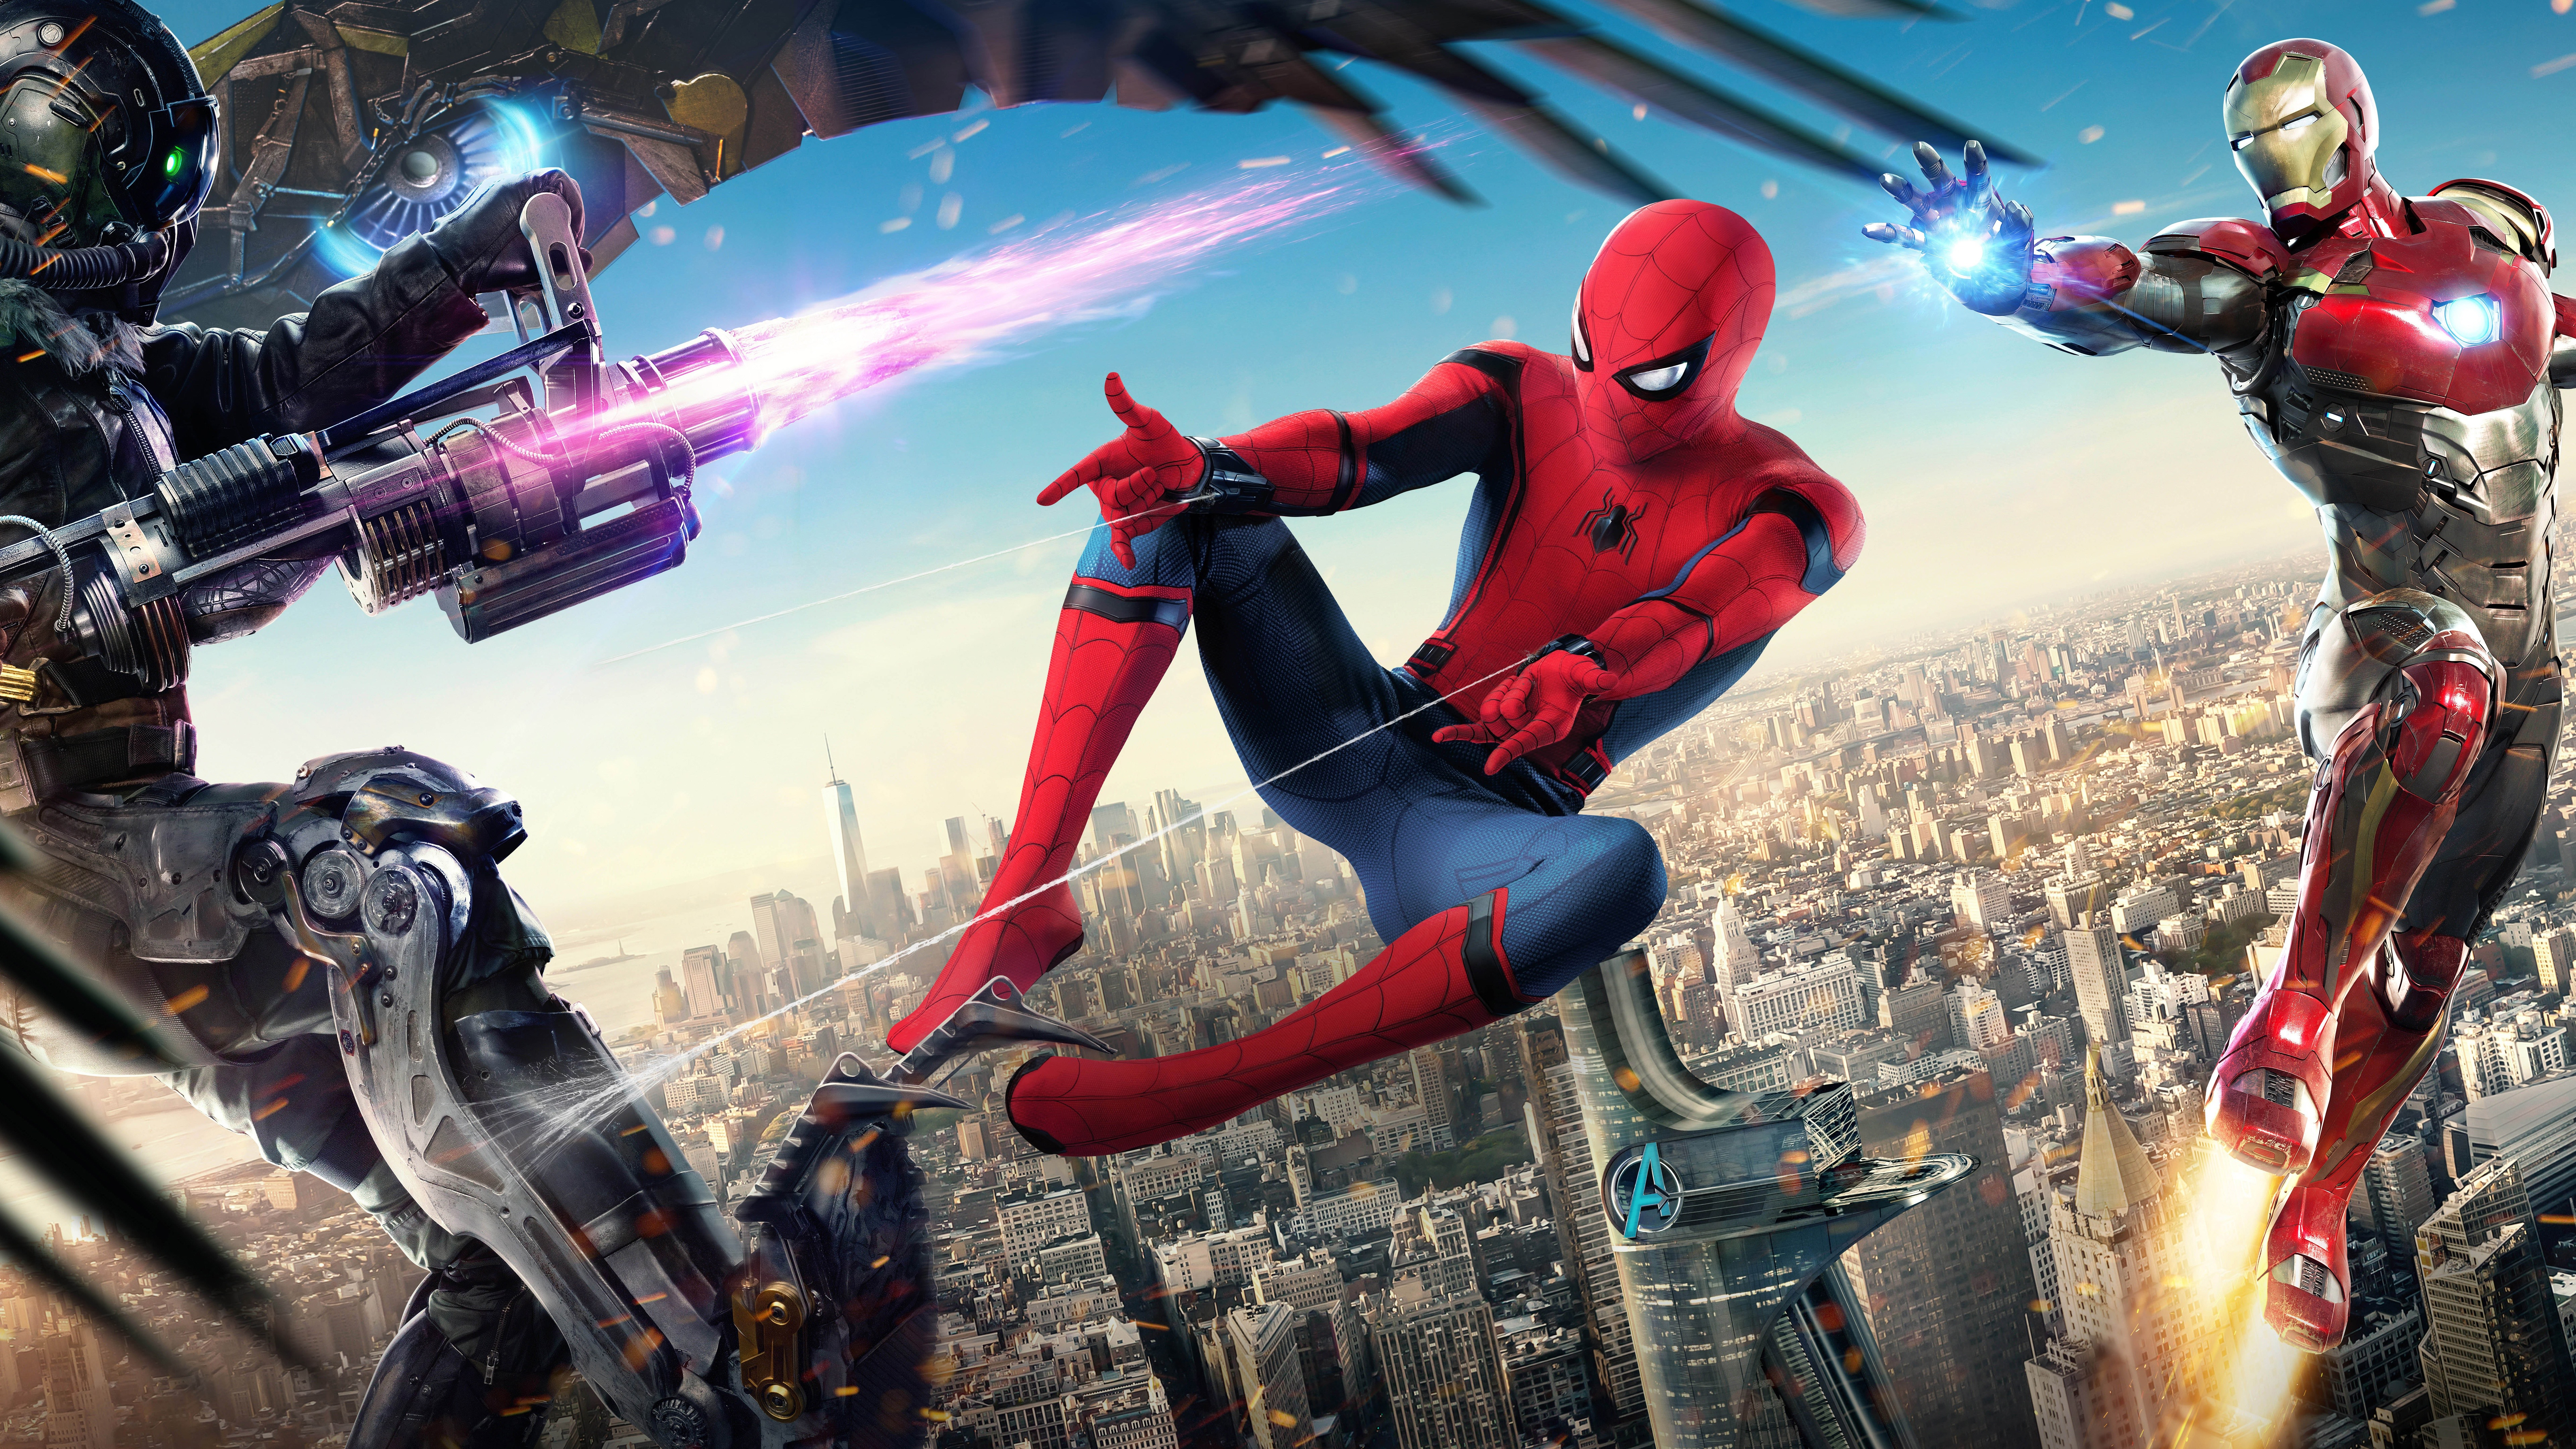 Homecoming Iron Man Marvel Superheroes Spider Man Far From Home 7680x43 Wallpaper Teahub Io